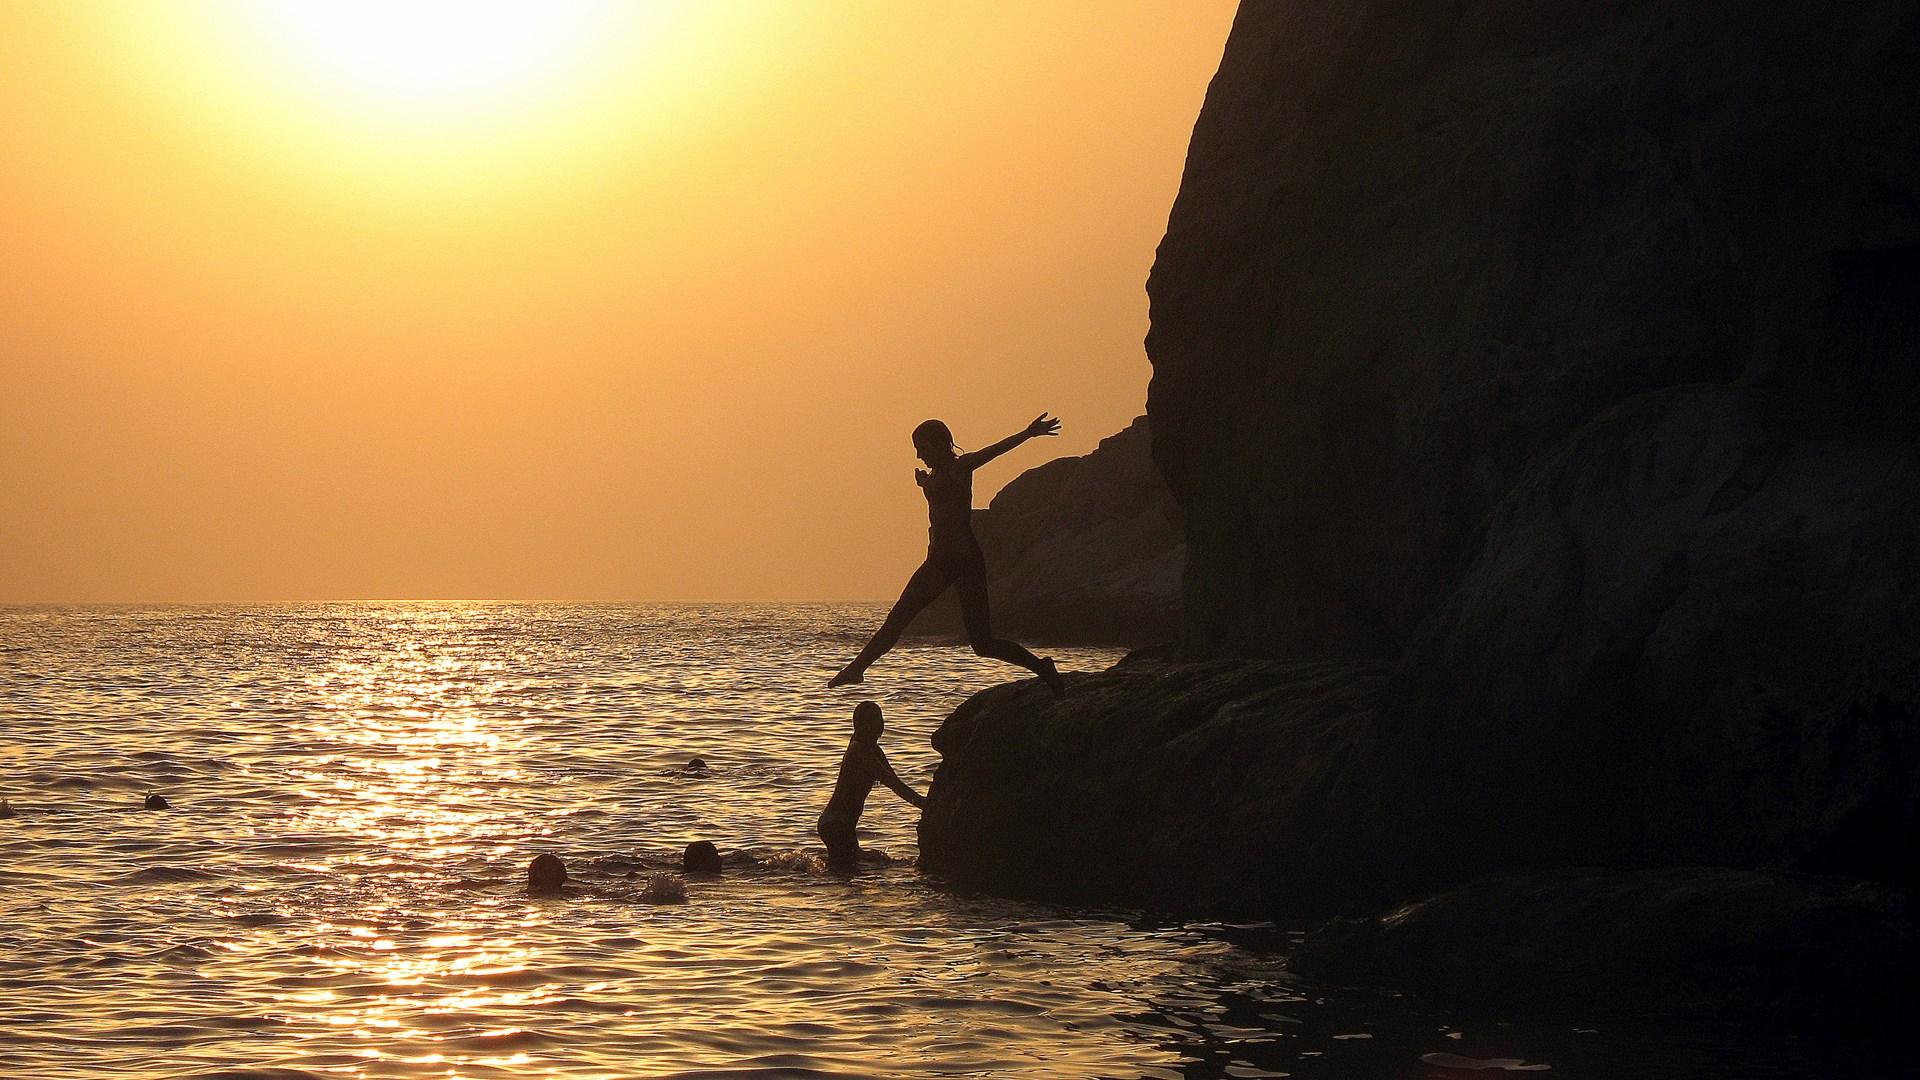 Matala, Heraklion - Crete | 07 Aug 2014  | Alargo